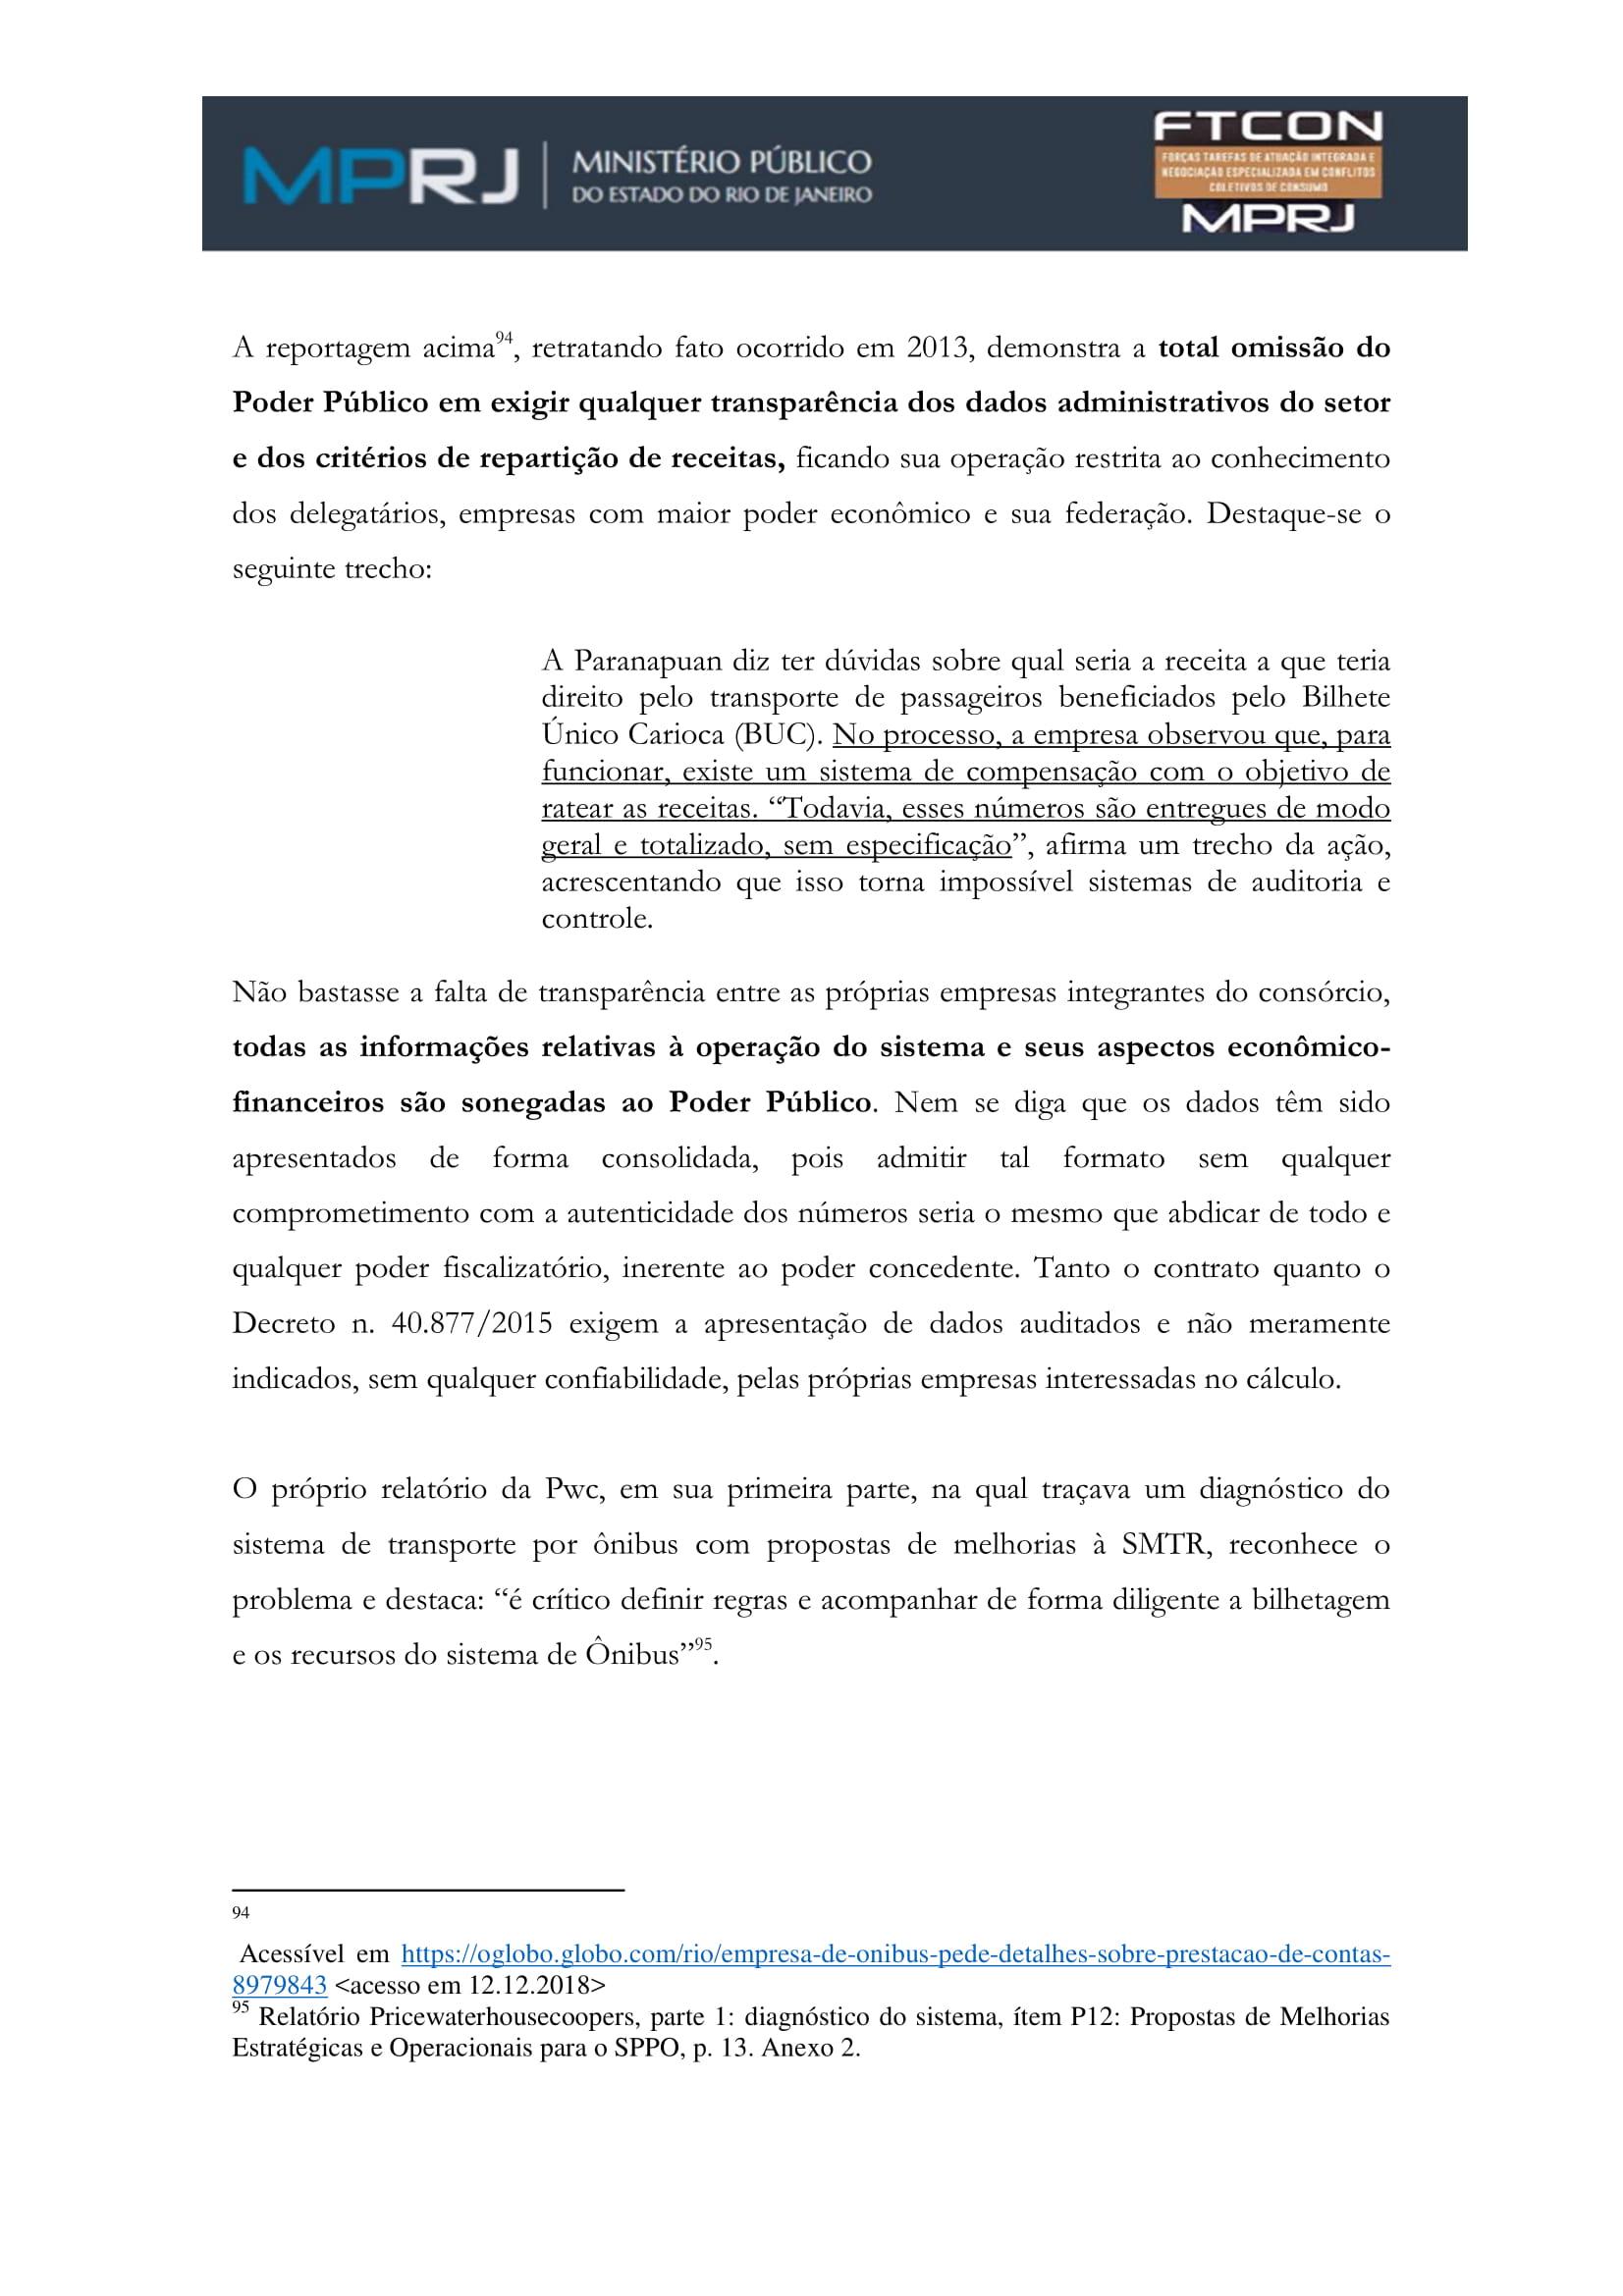 acp_caducidade_onibus_dr_rt-105